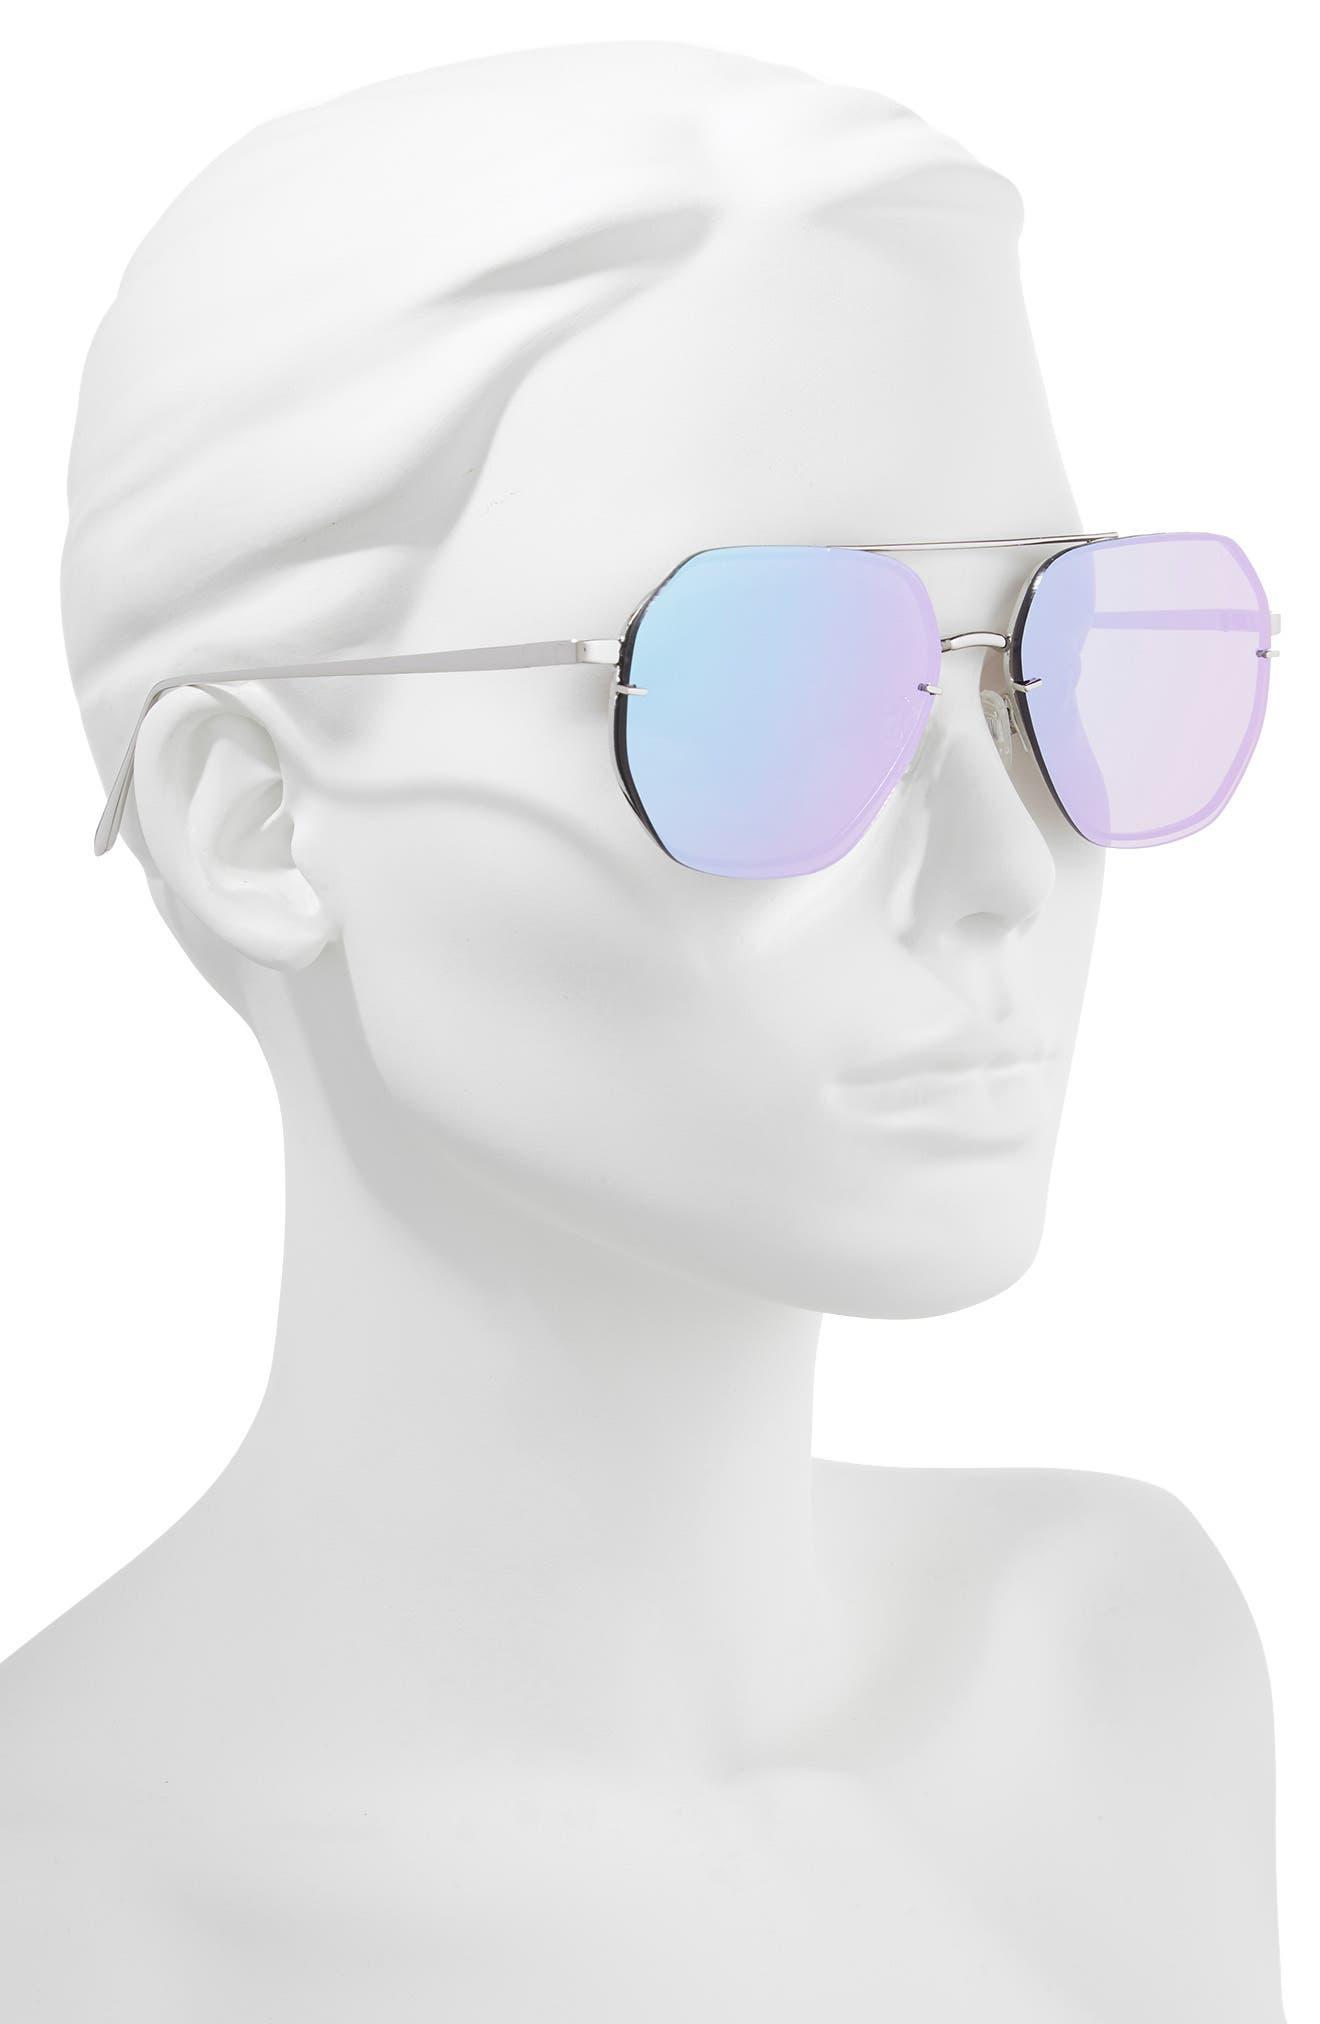 62mm Metal Flat Geo Aviator Sunglasses,                             Alternate thumbnail 2, color,                             SILVER/ PURPLE